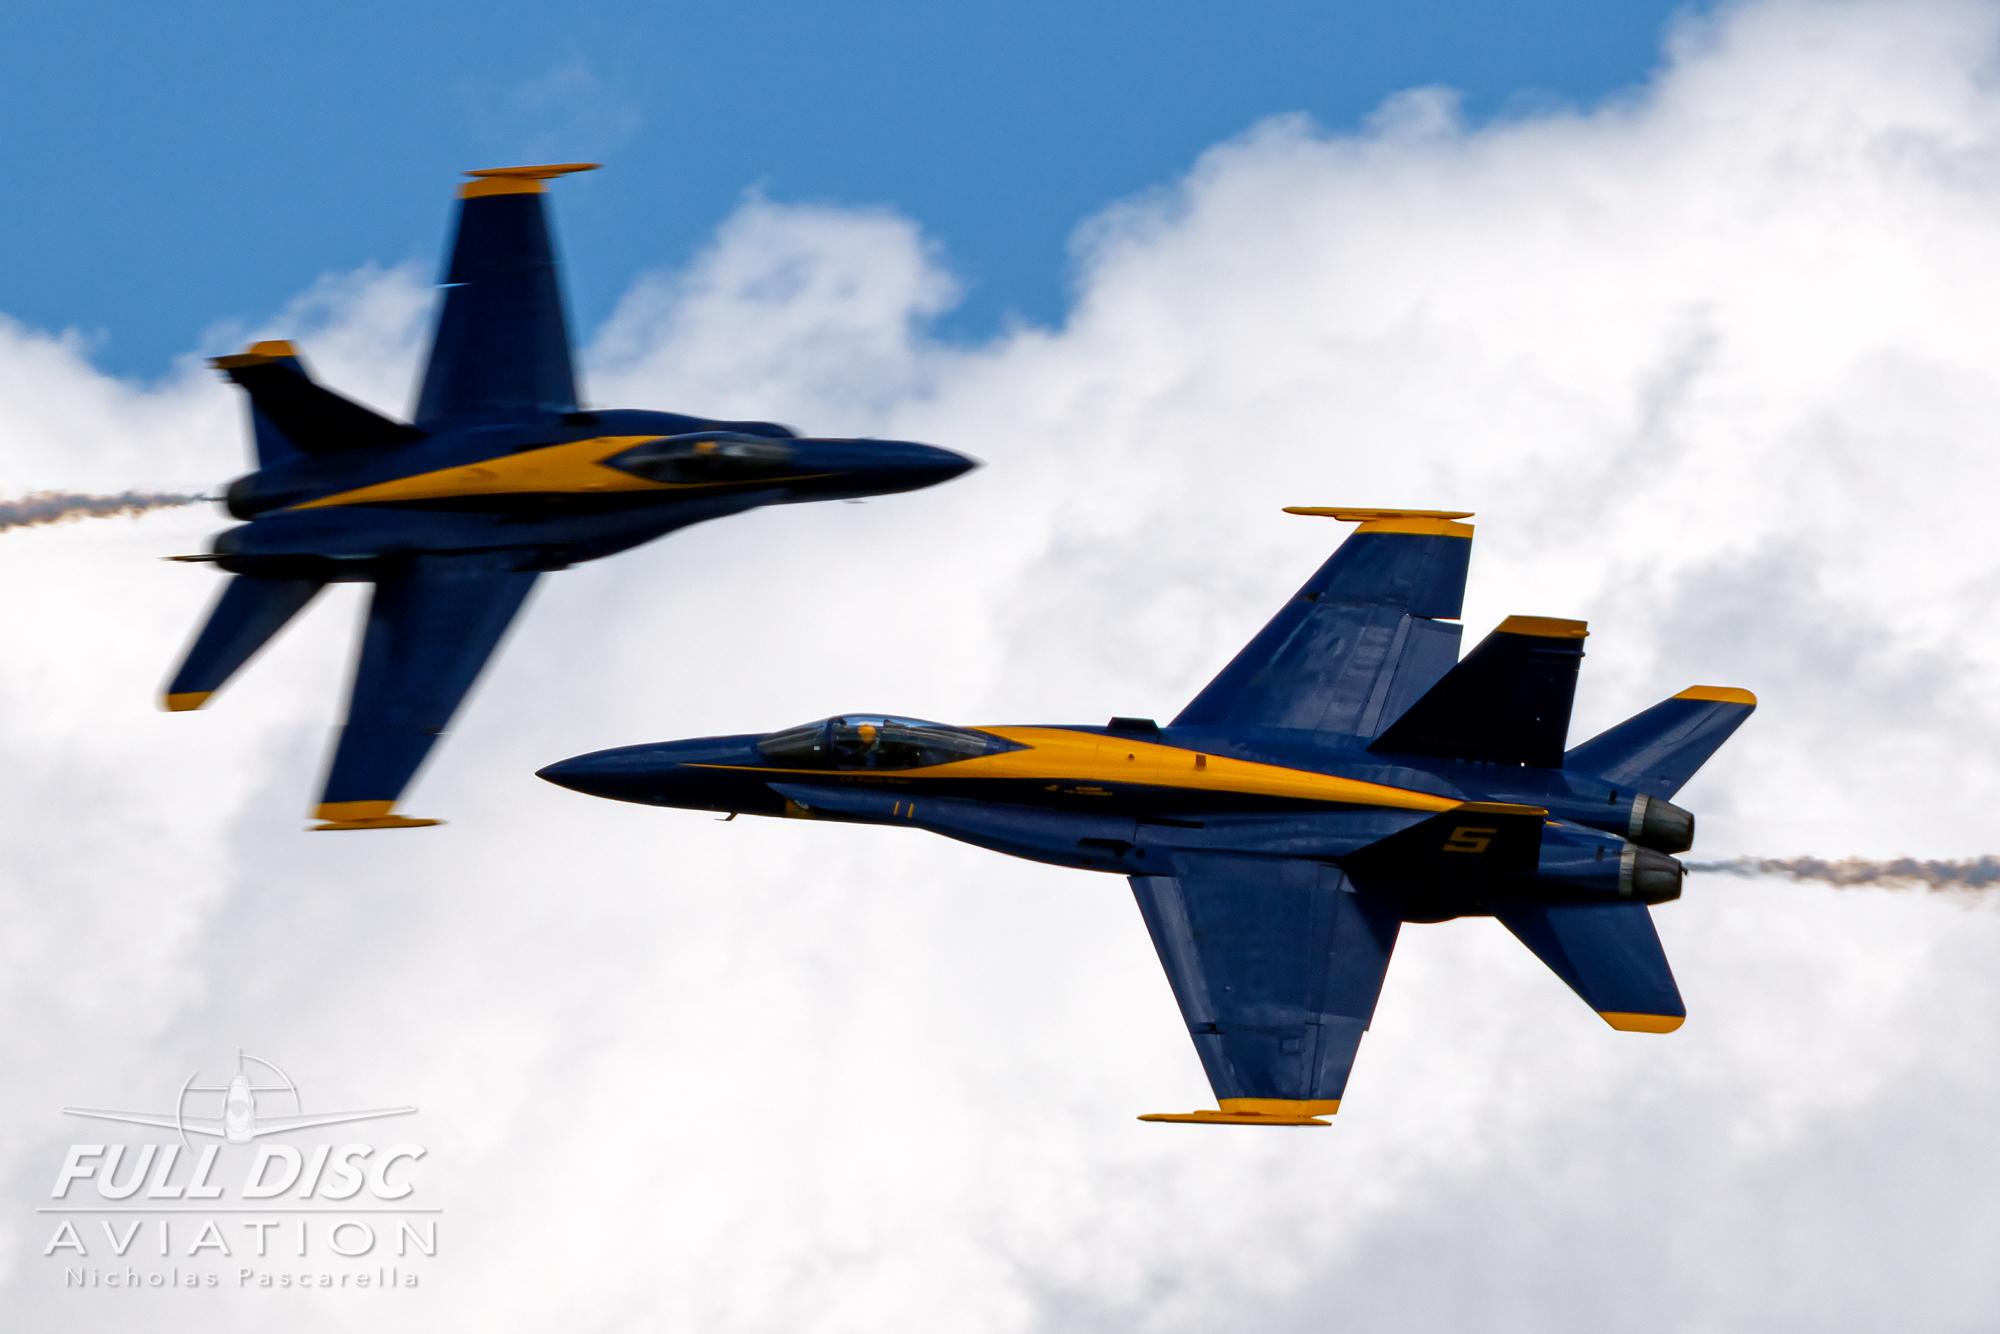 nickpascarella_fulldiscaviation_oceancityairshow_aviation_blueangels_cross.jpg